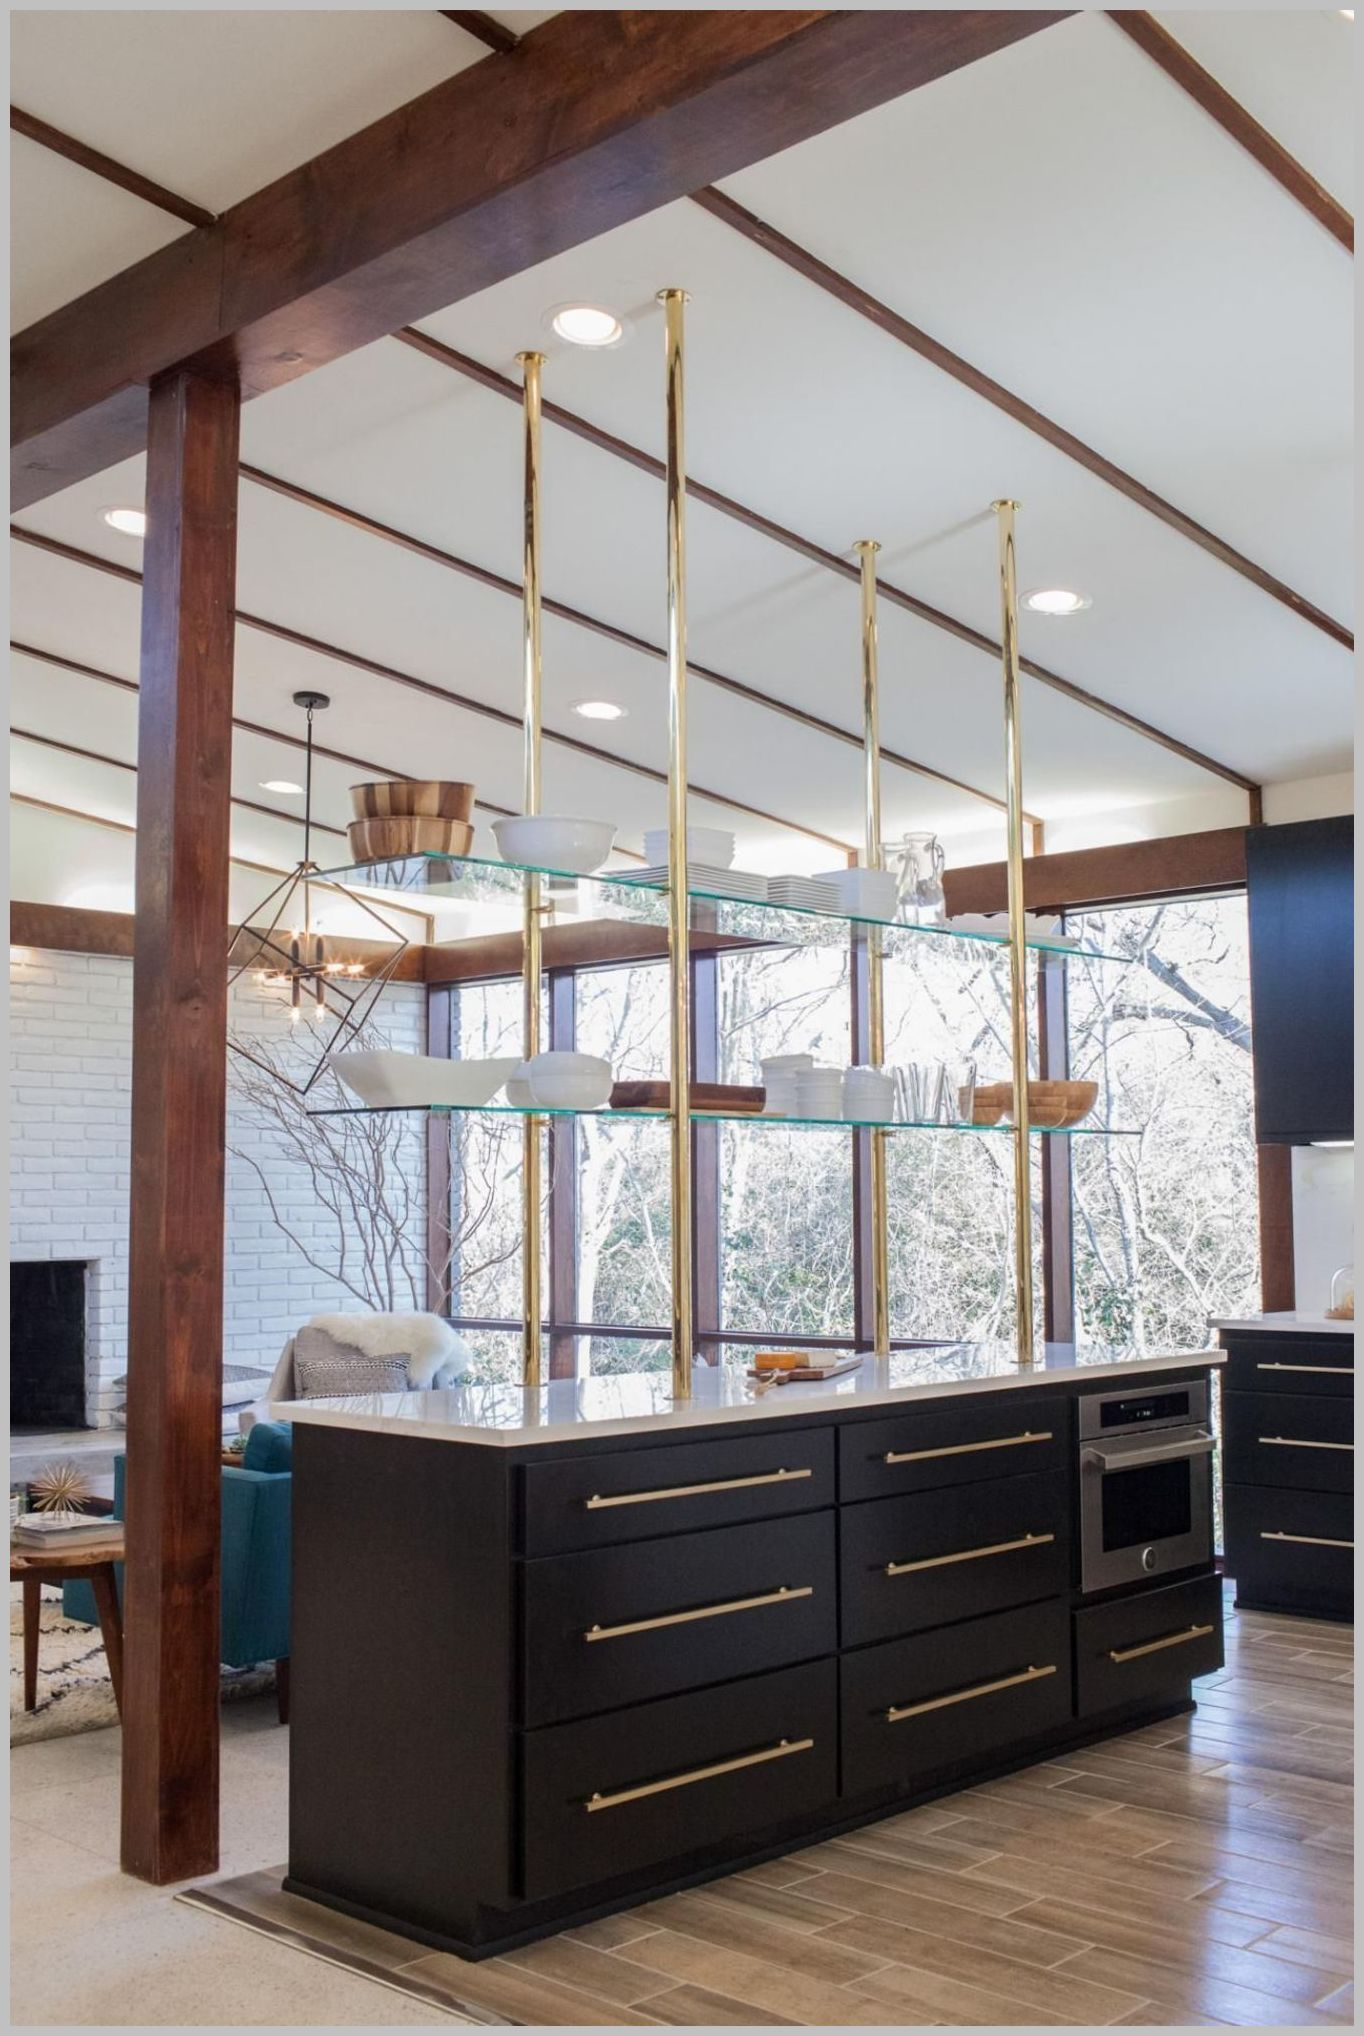 Home Bar ] Simple But Great Home Bar Ideas #HomeBar | Home Bar ...